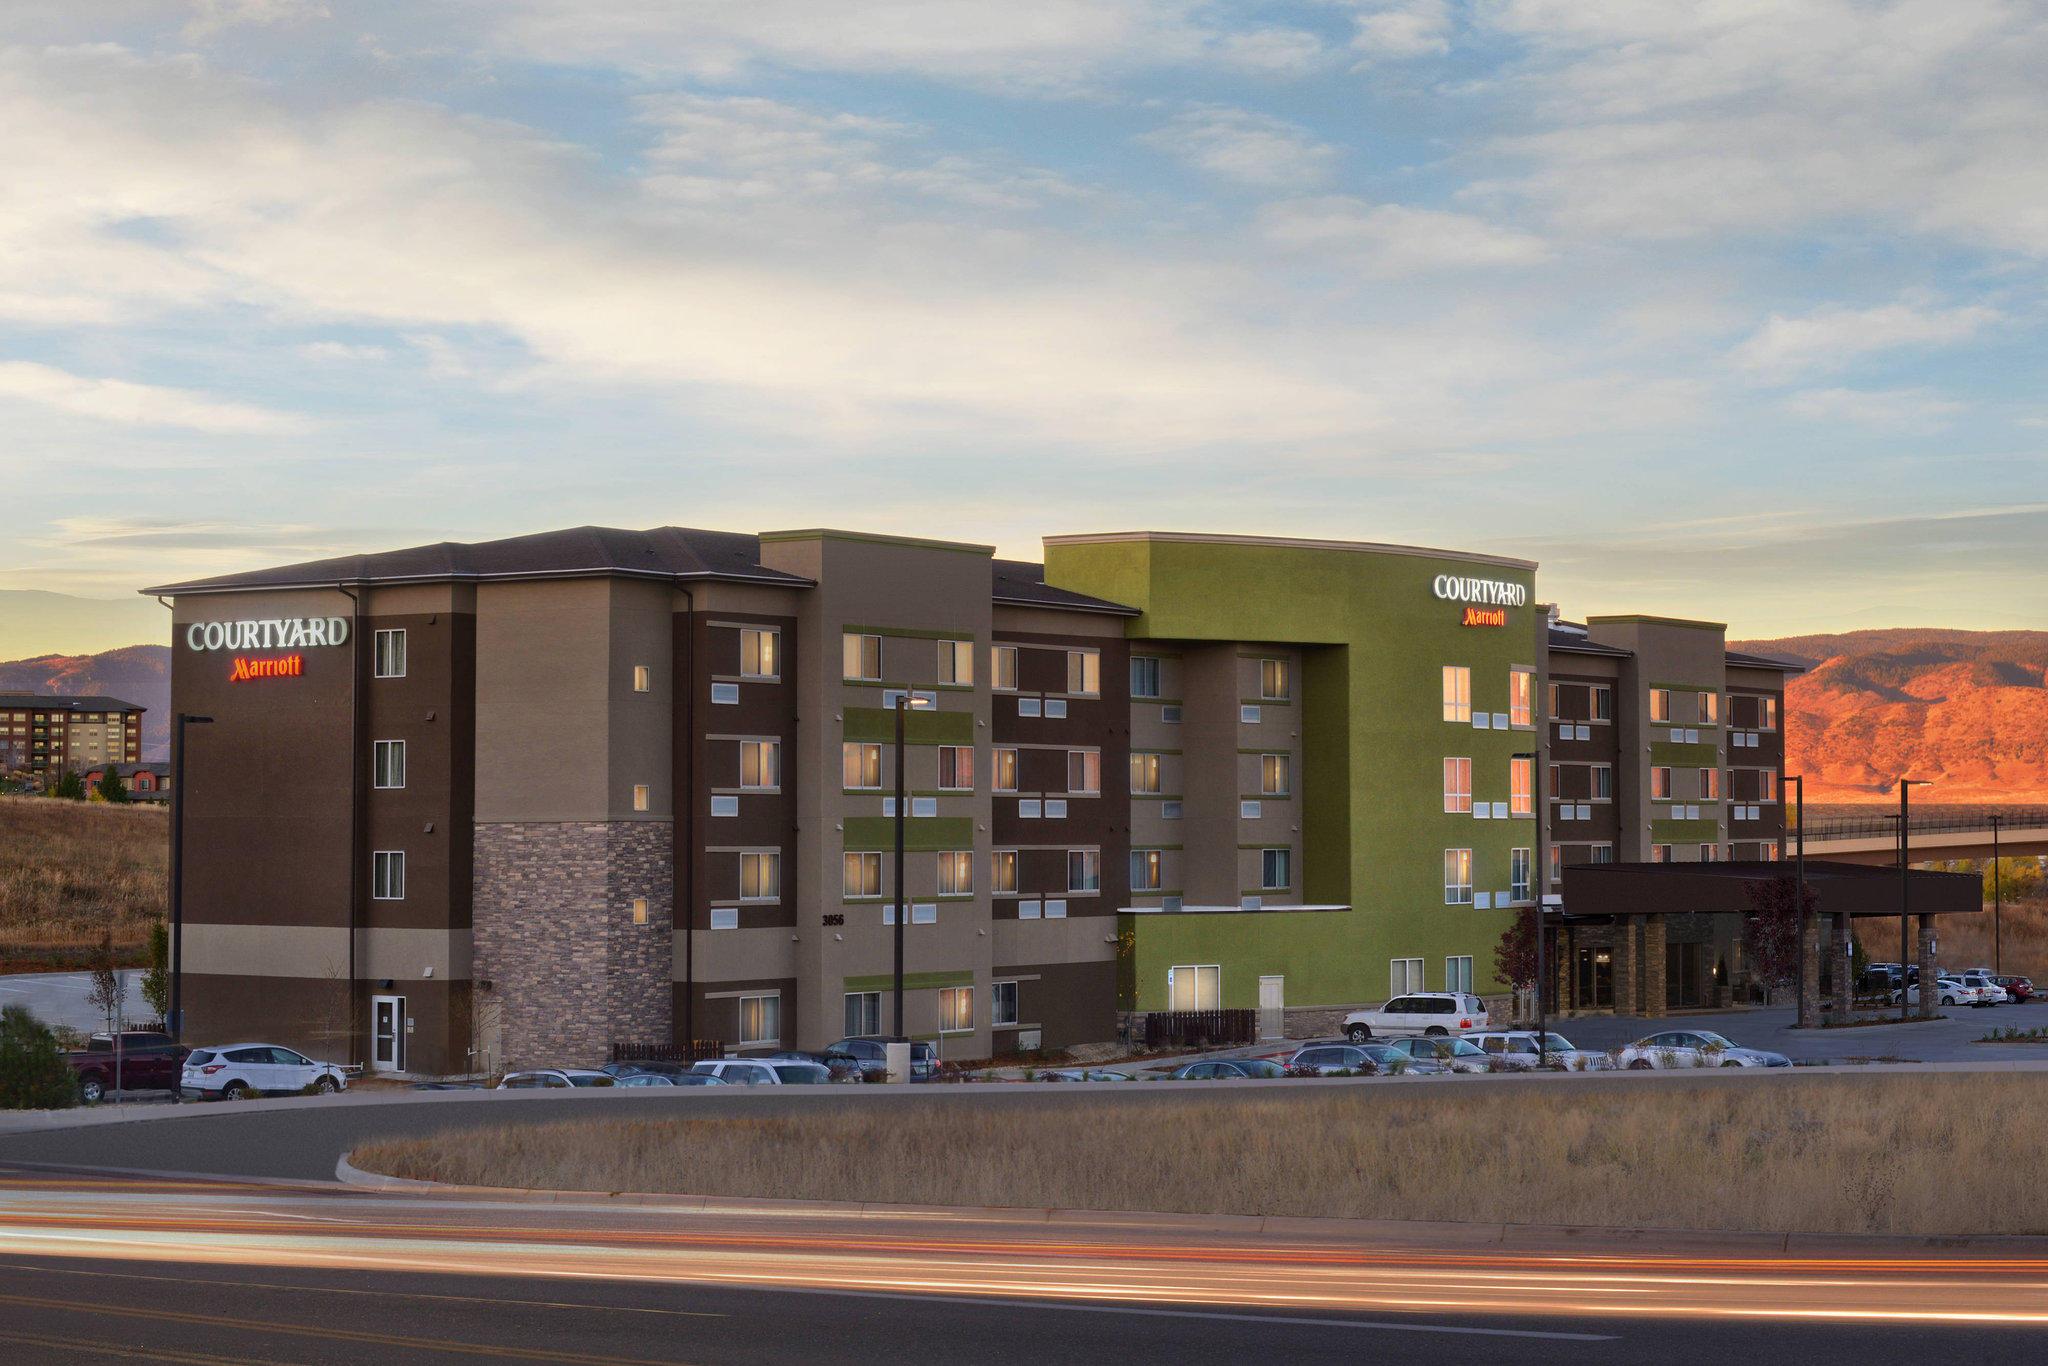 Courtyard by Marriott Denver Southwest/Littleton